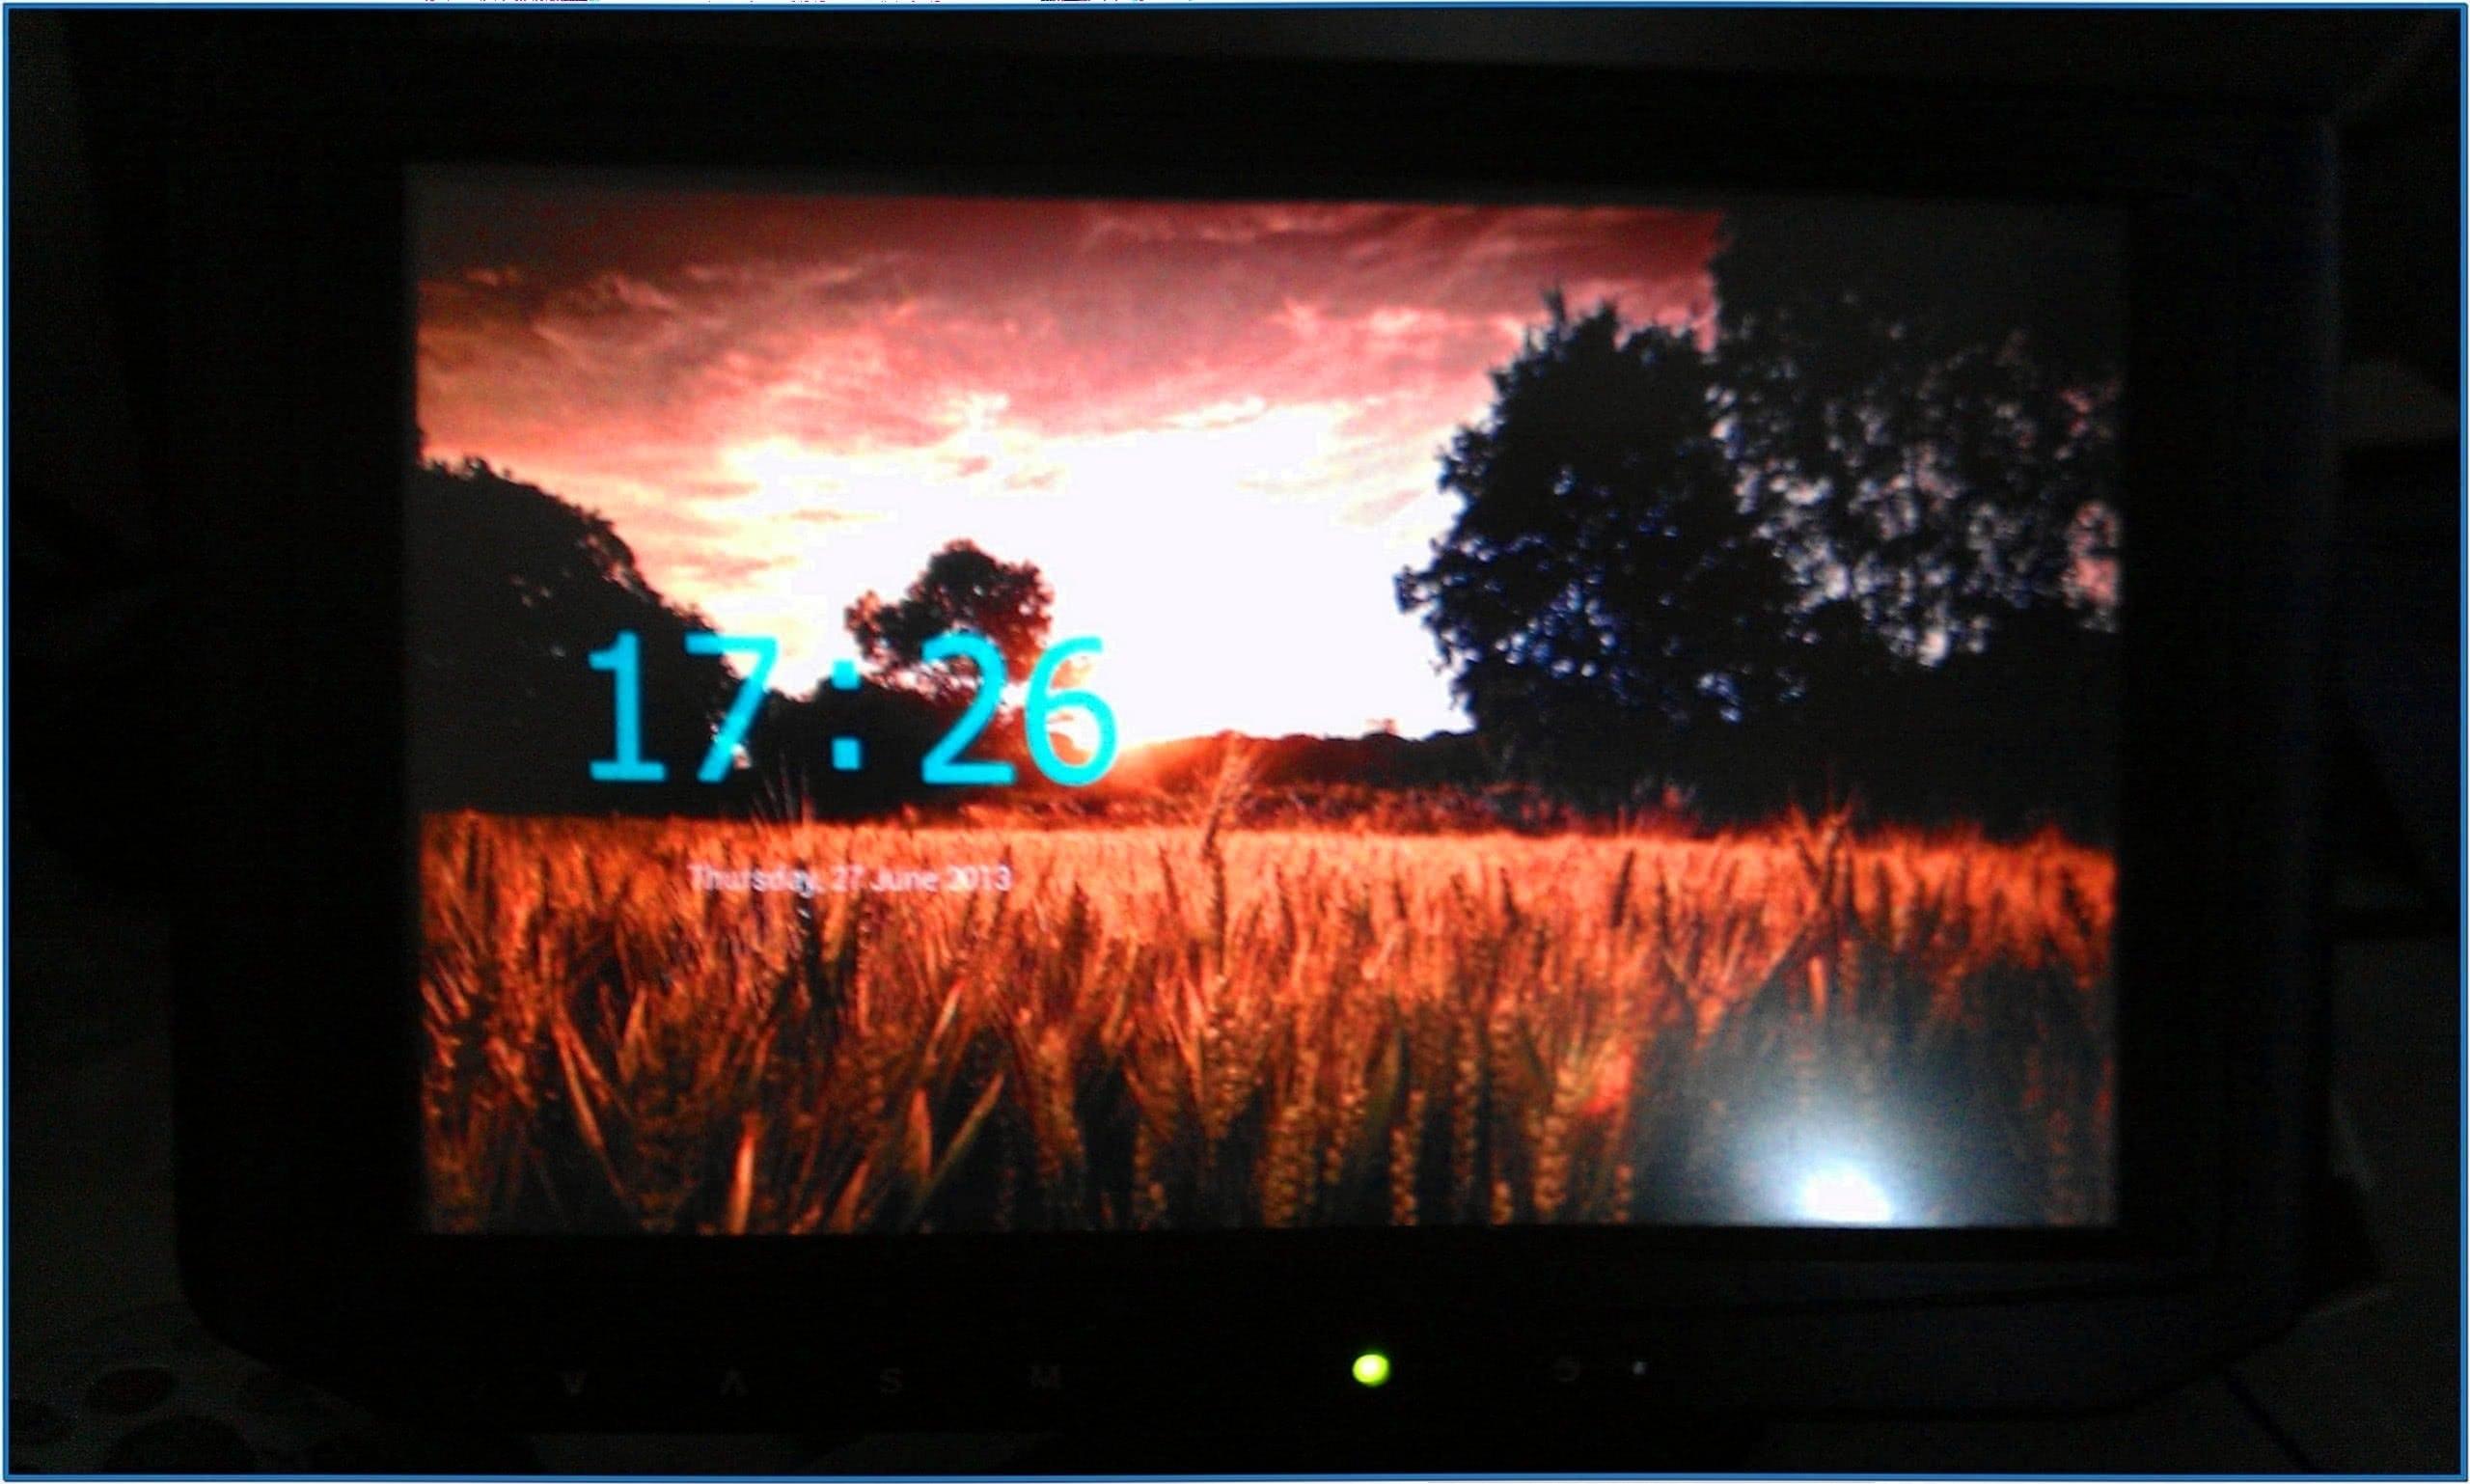 Clock Screensaver Xbmc